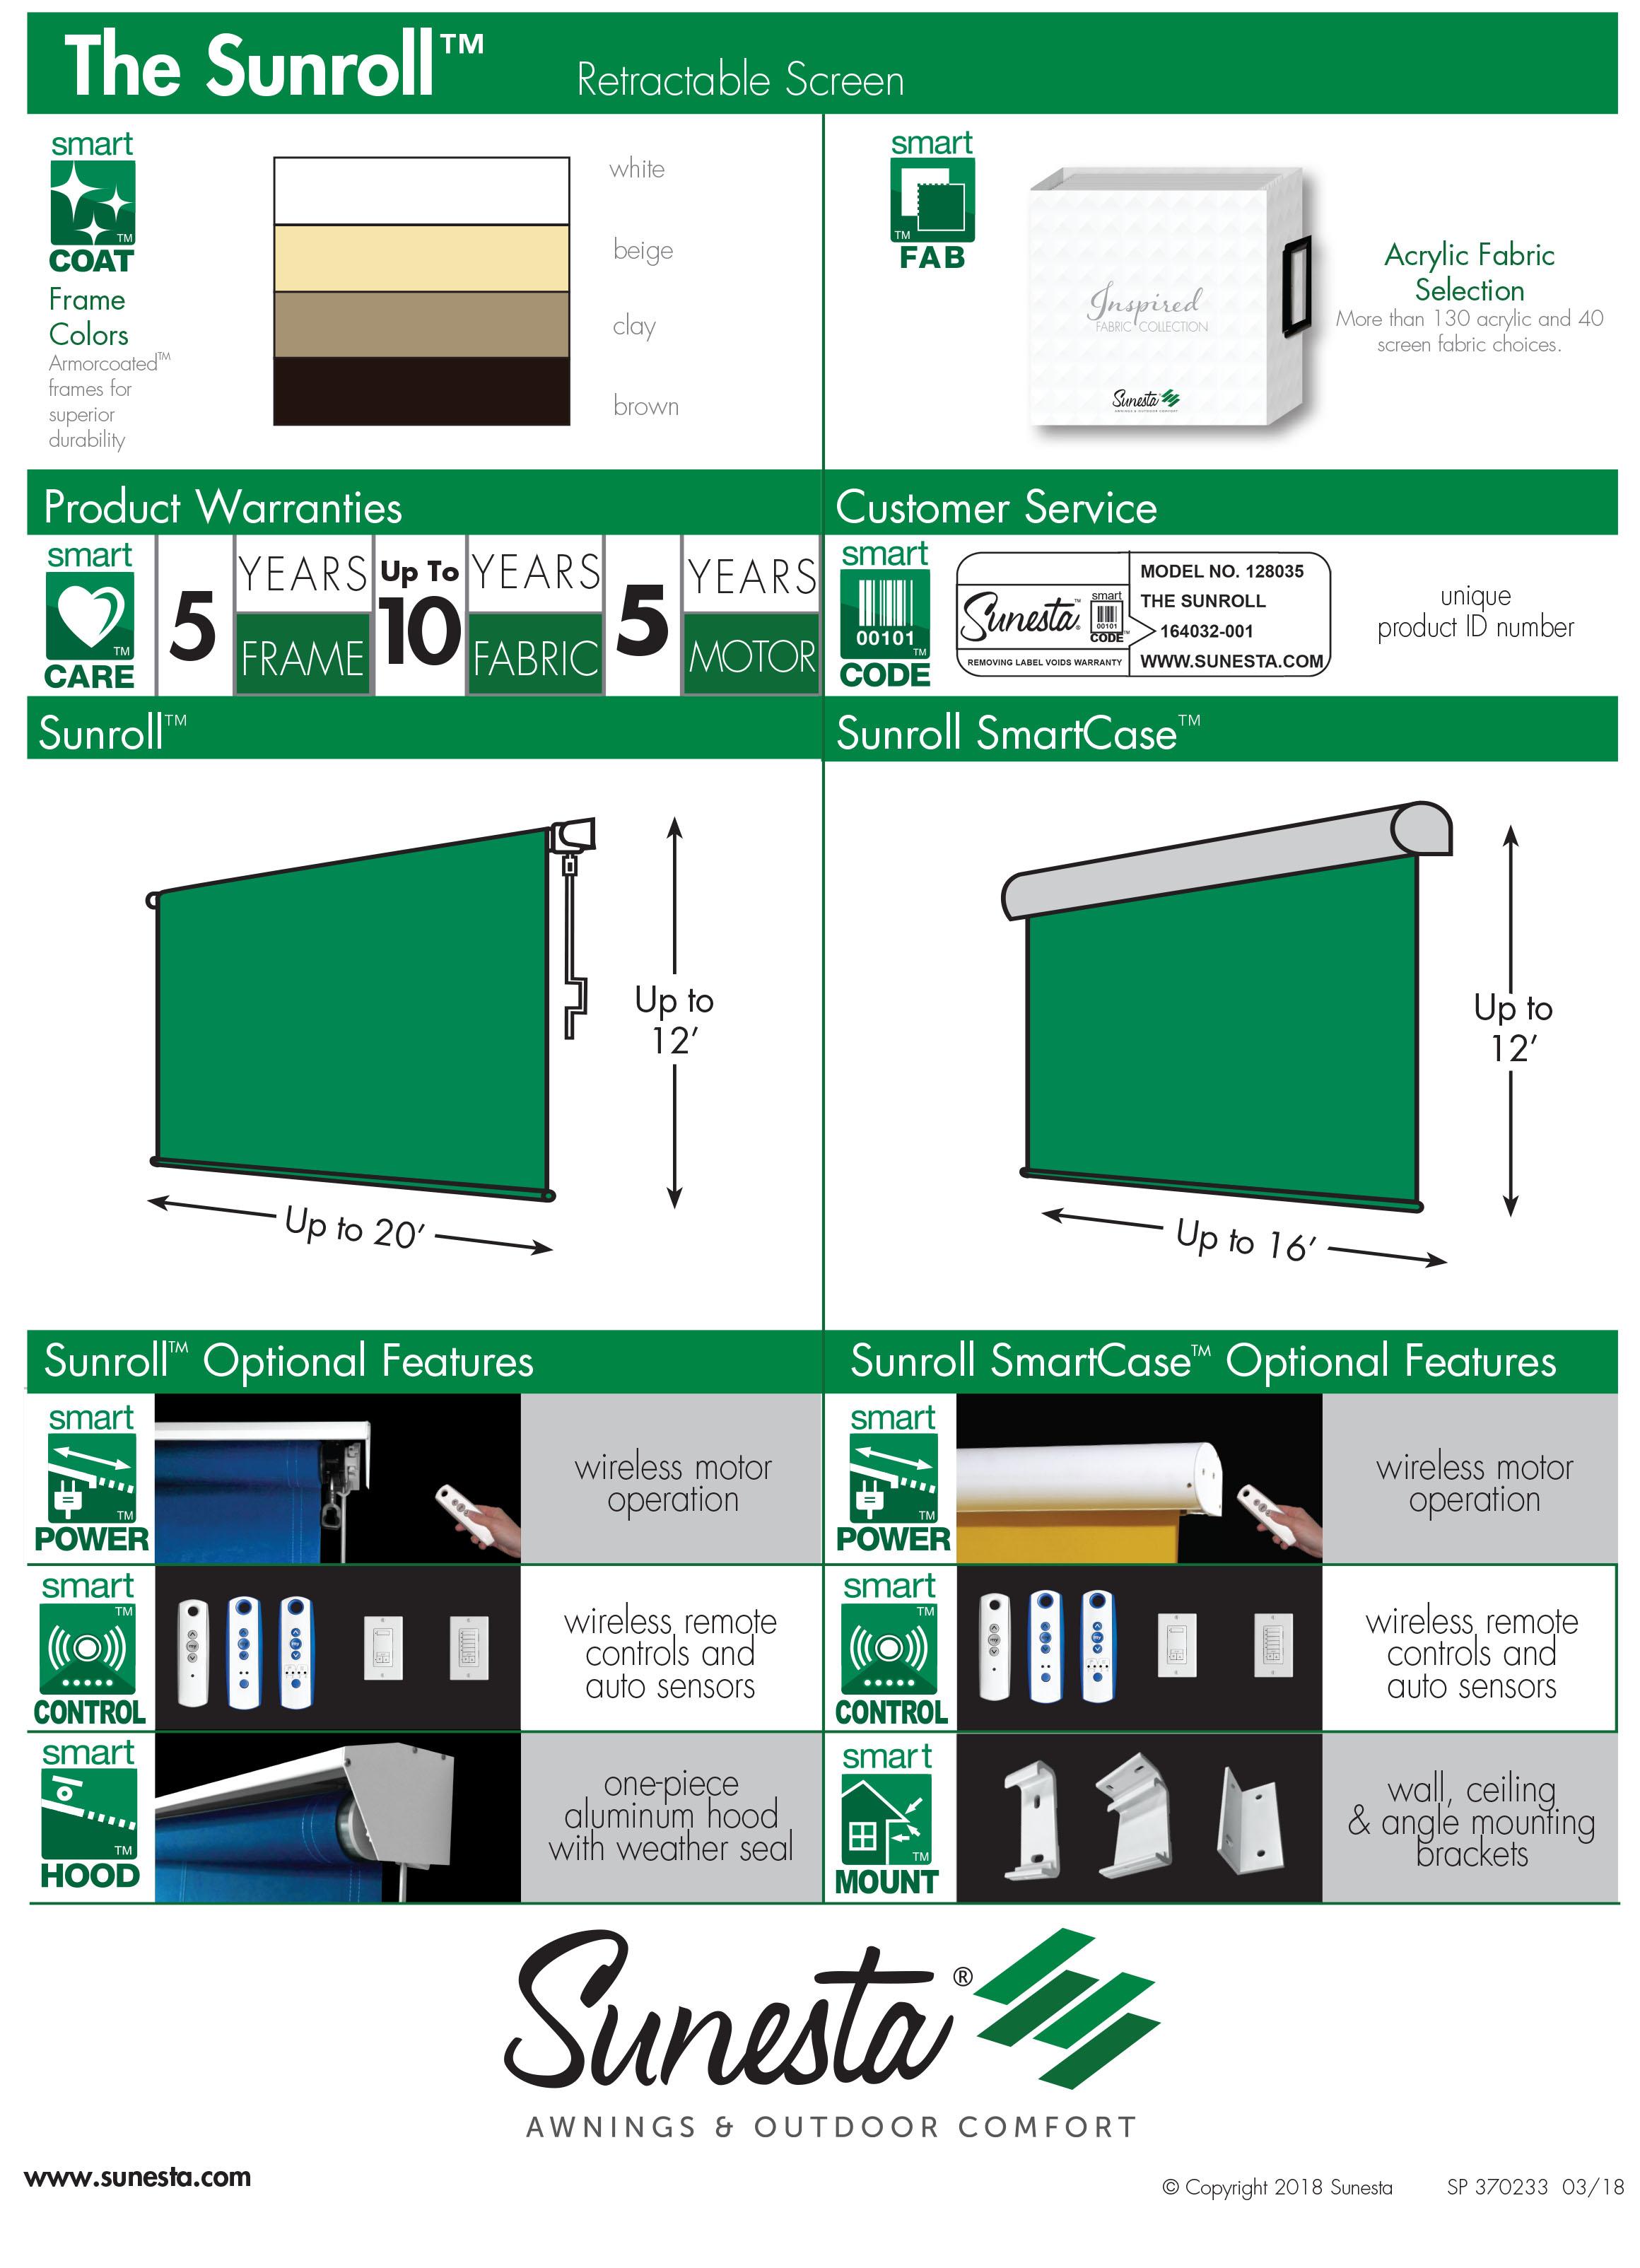 Sunroll Product Information Sheet